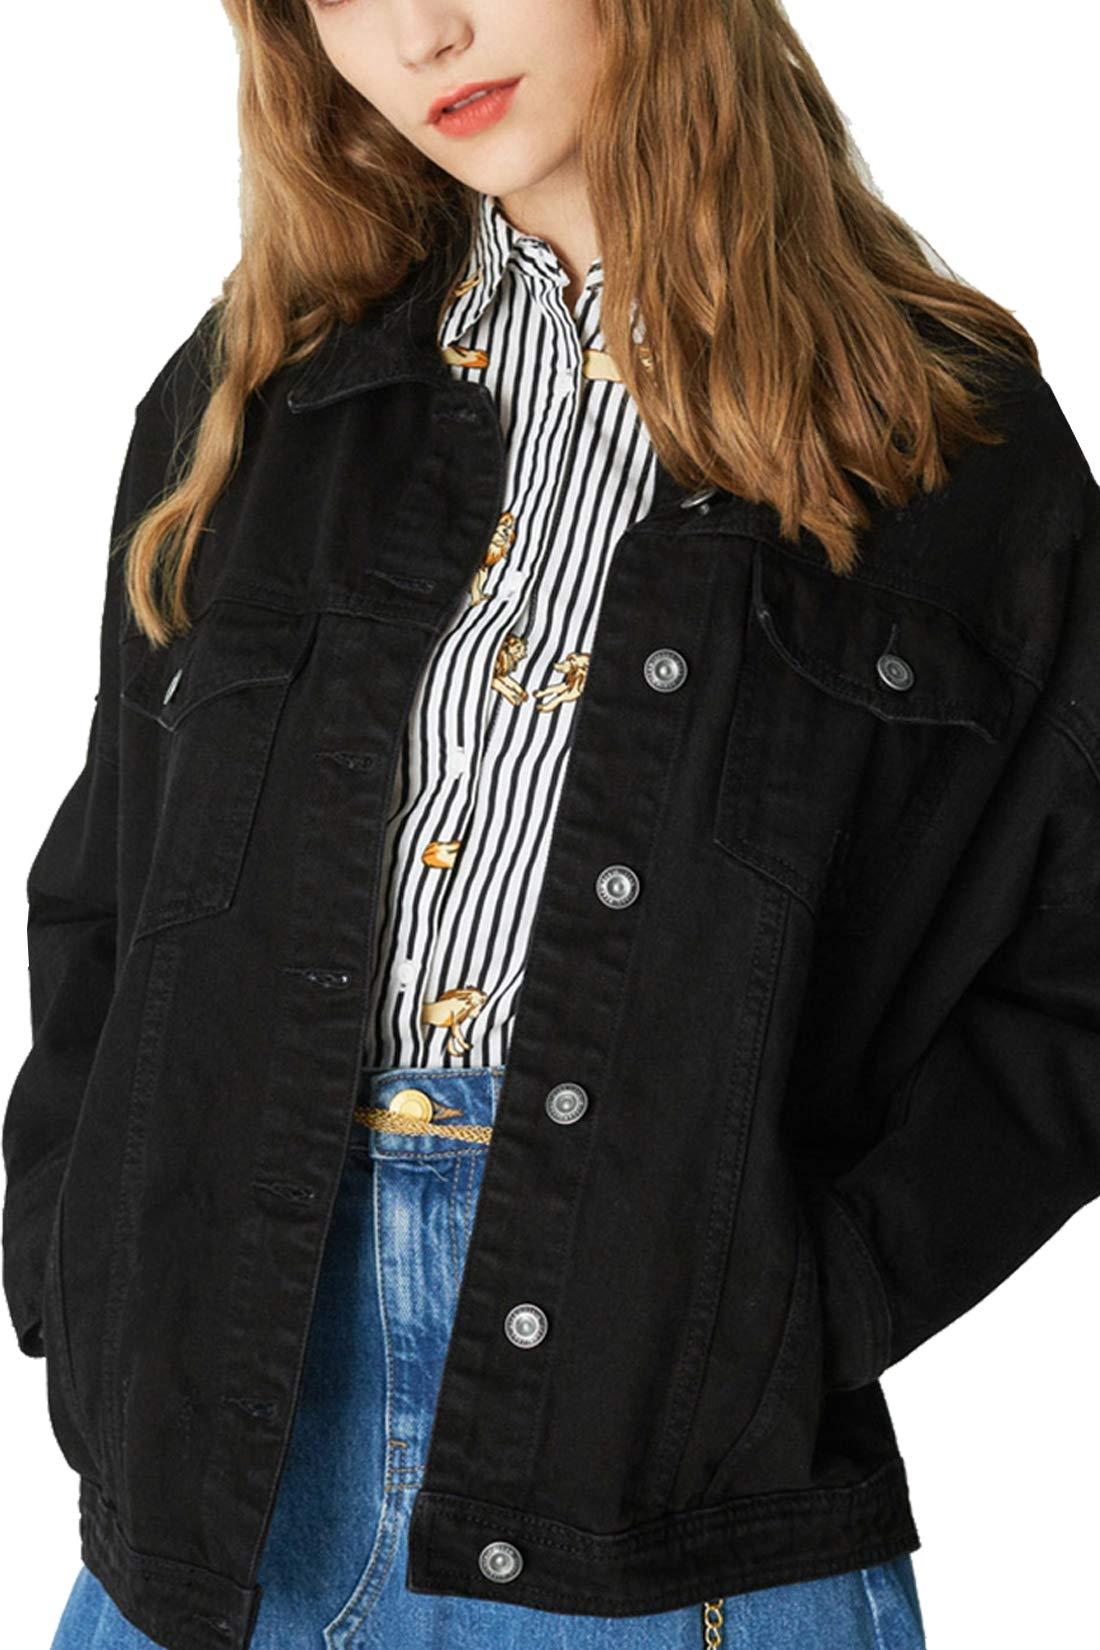 719ac25fcfb2 Tsher Women s Denim Jacket Long Sleeve Cotton Loose White Denim ...